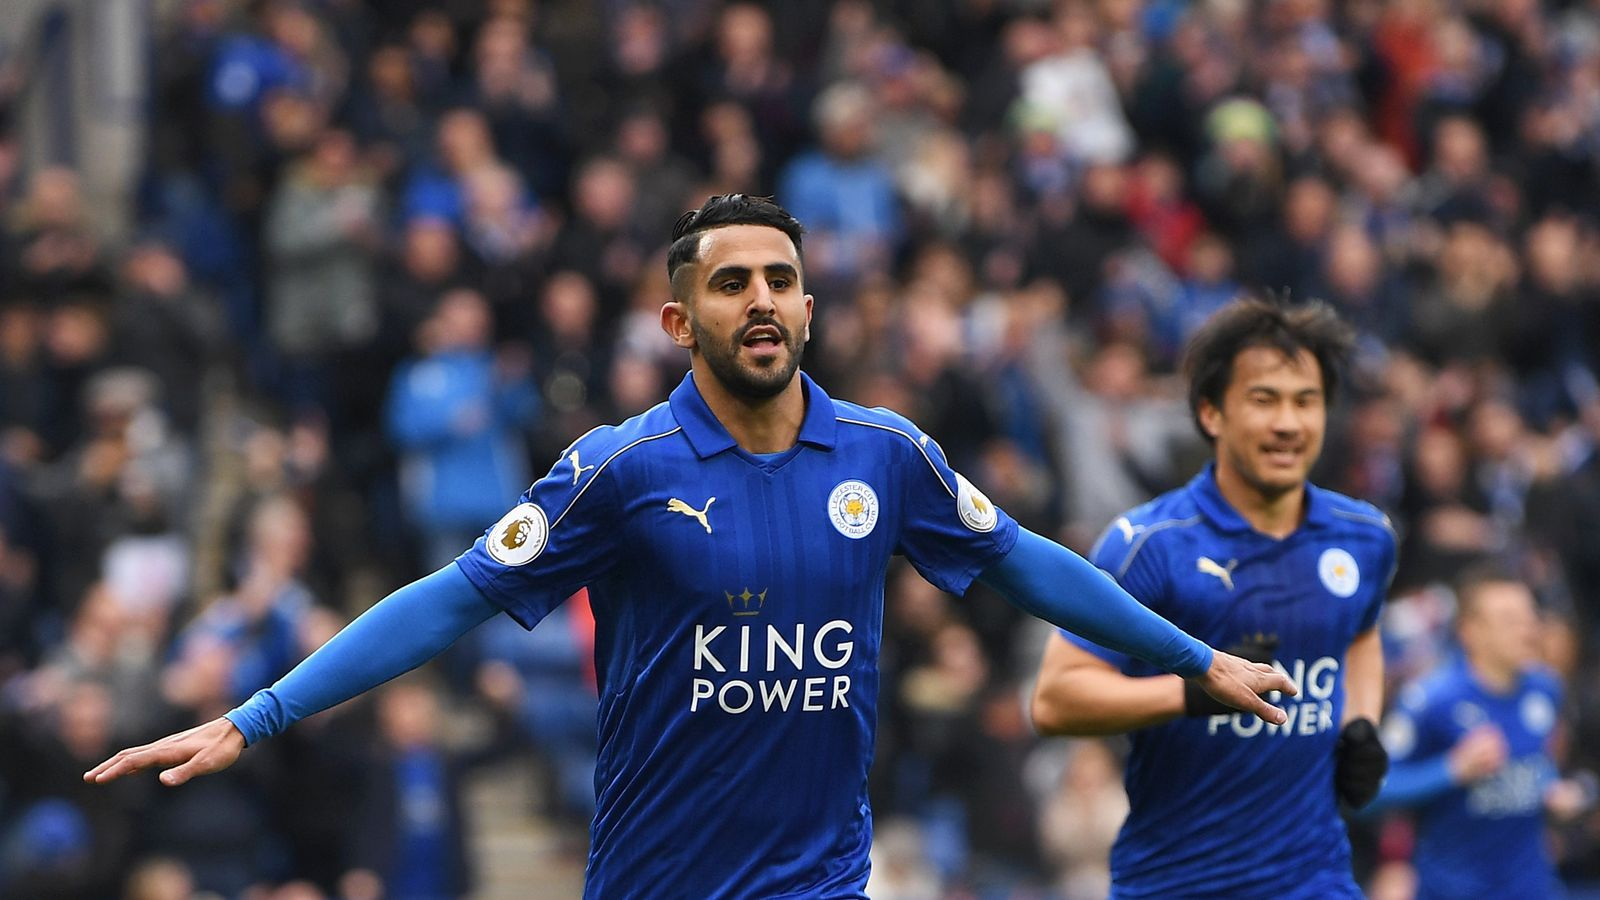 Tottenham Vs Leicester Predictions: Leicester City Vs. Tottenham Hotspur: Match Preview